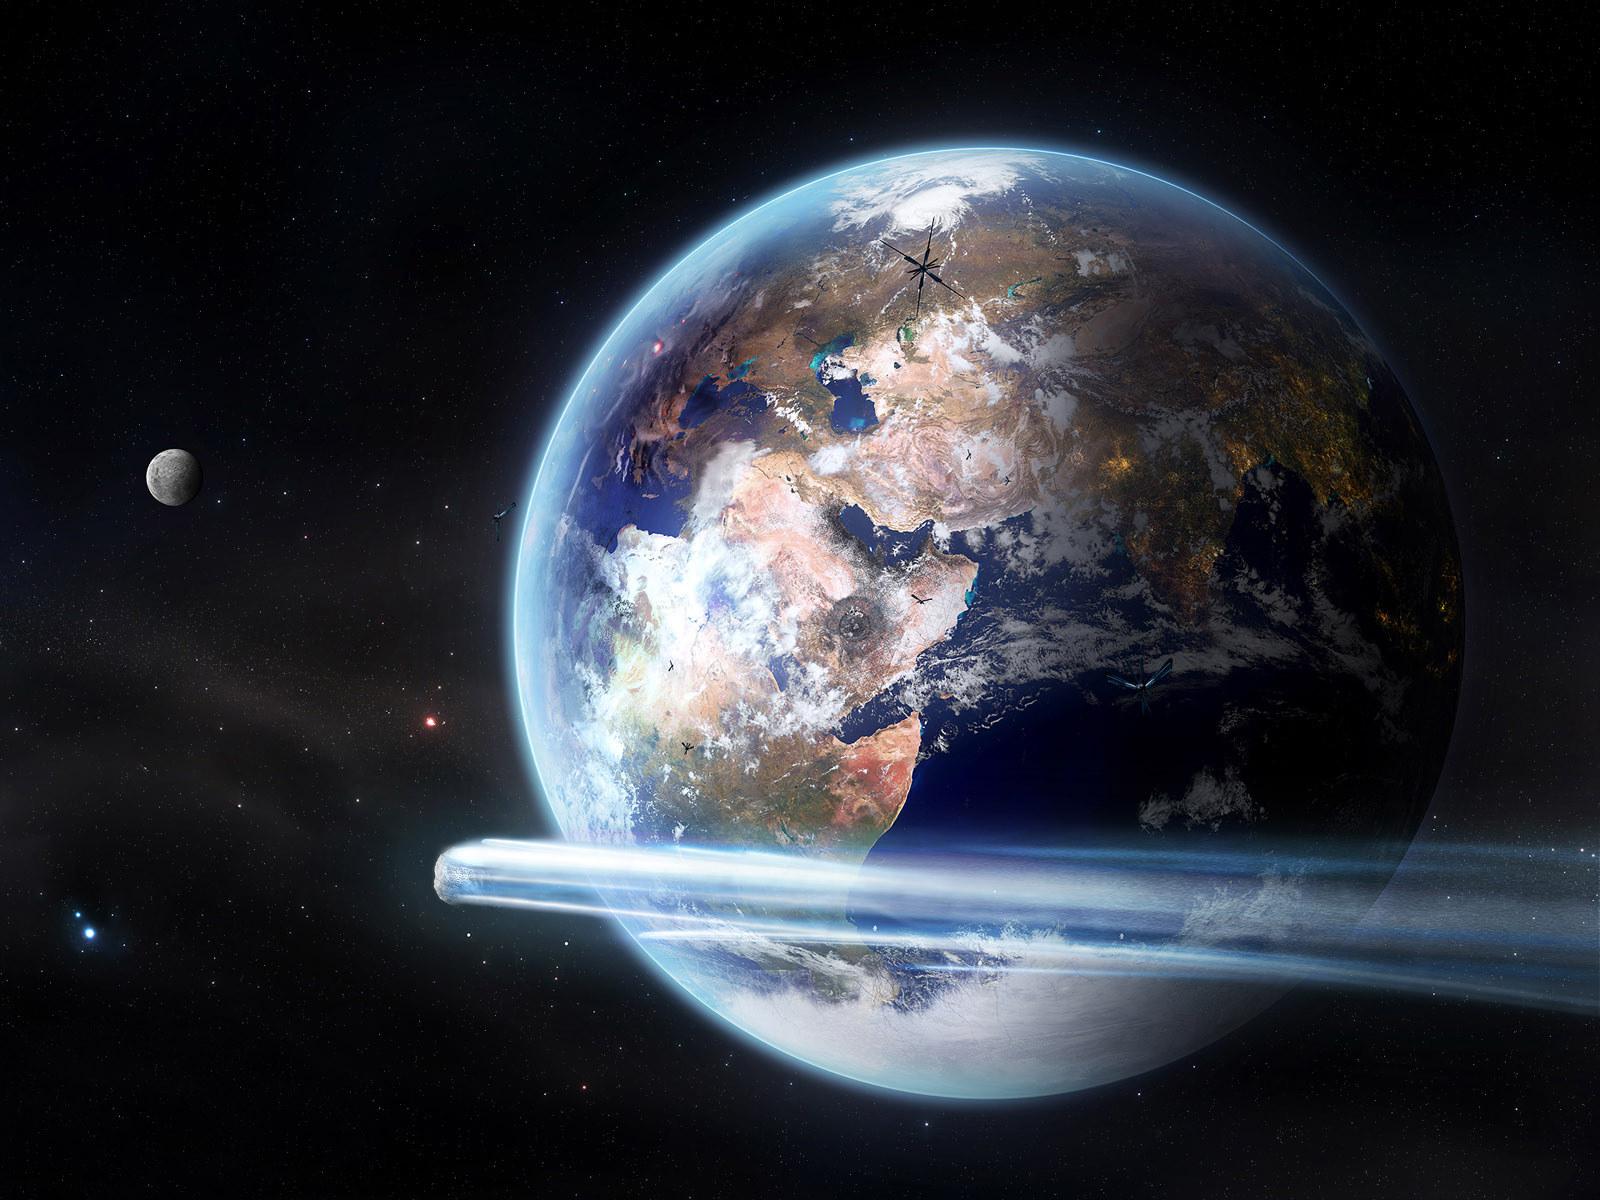 картина земли: